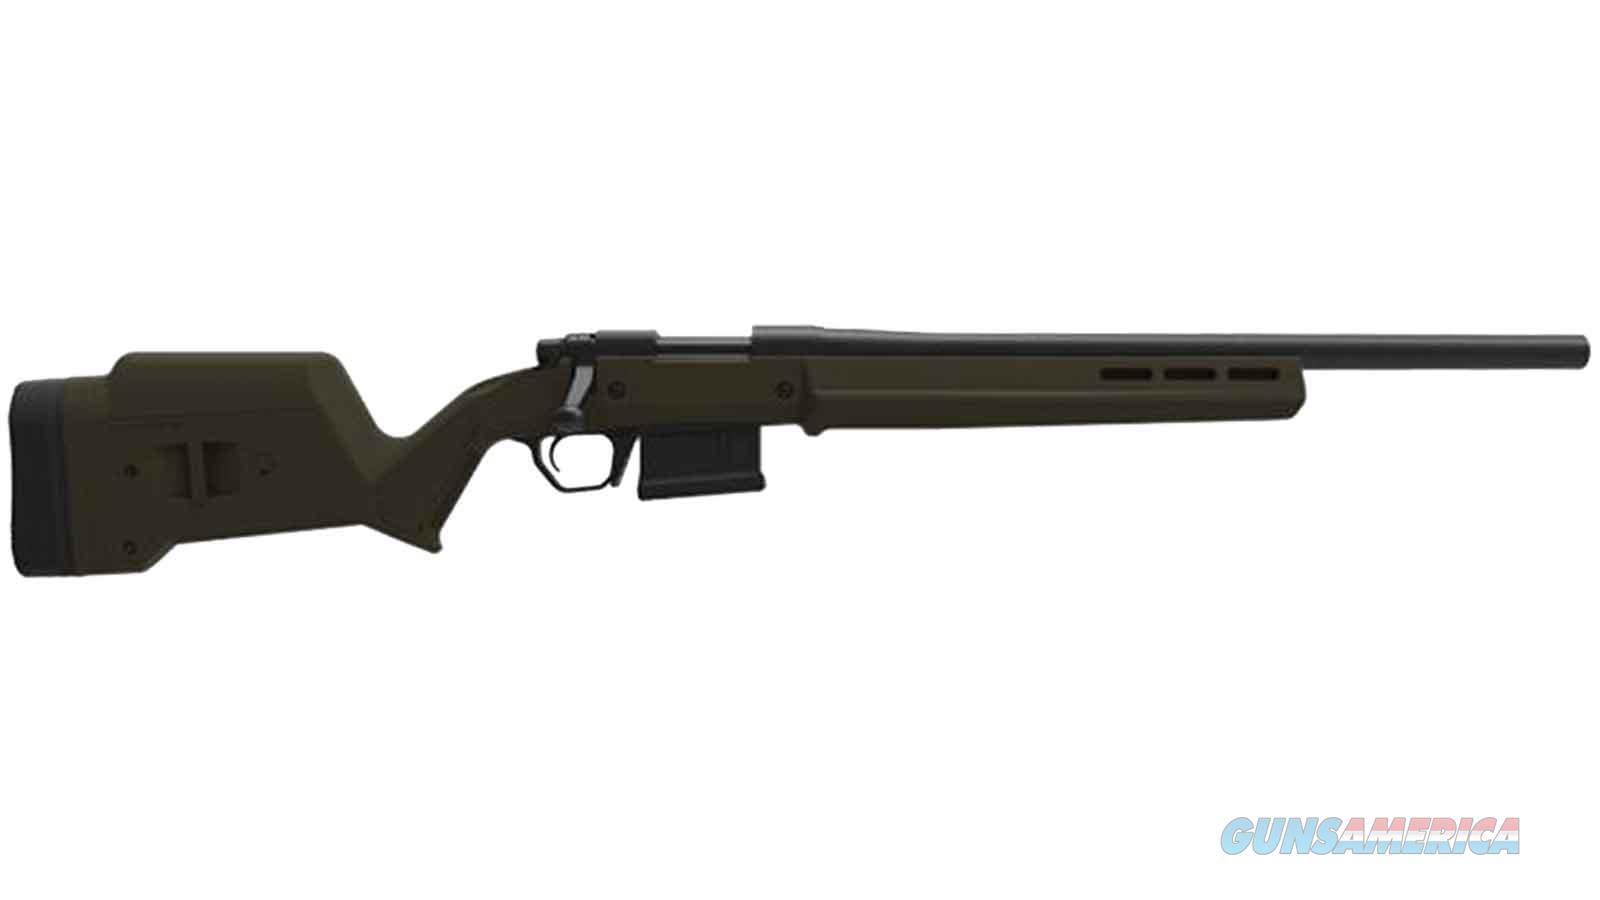 Magpul Industries Corporation Hunter 700 S/A Stock Odg MAG495-ODG  Non-Guns > Gunstocks, Grips & Wood